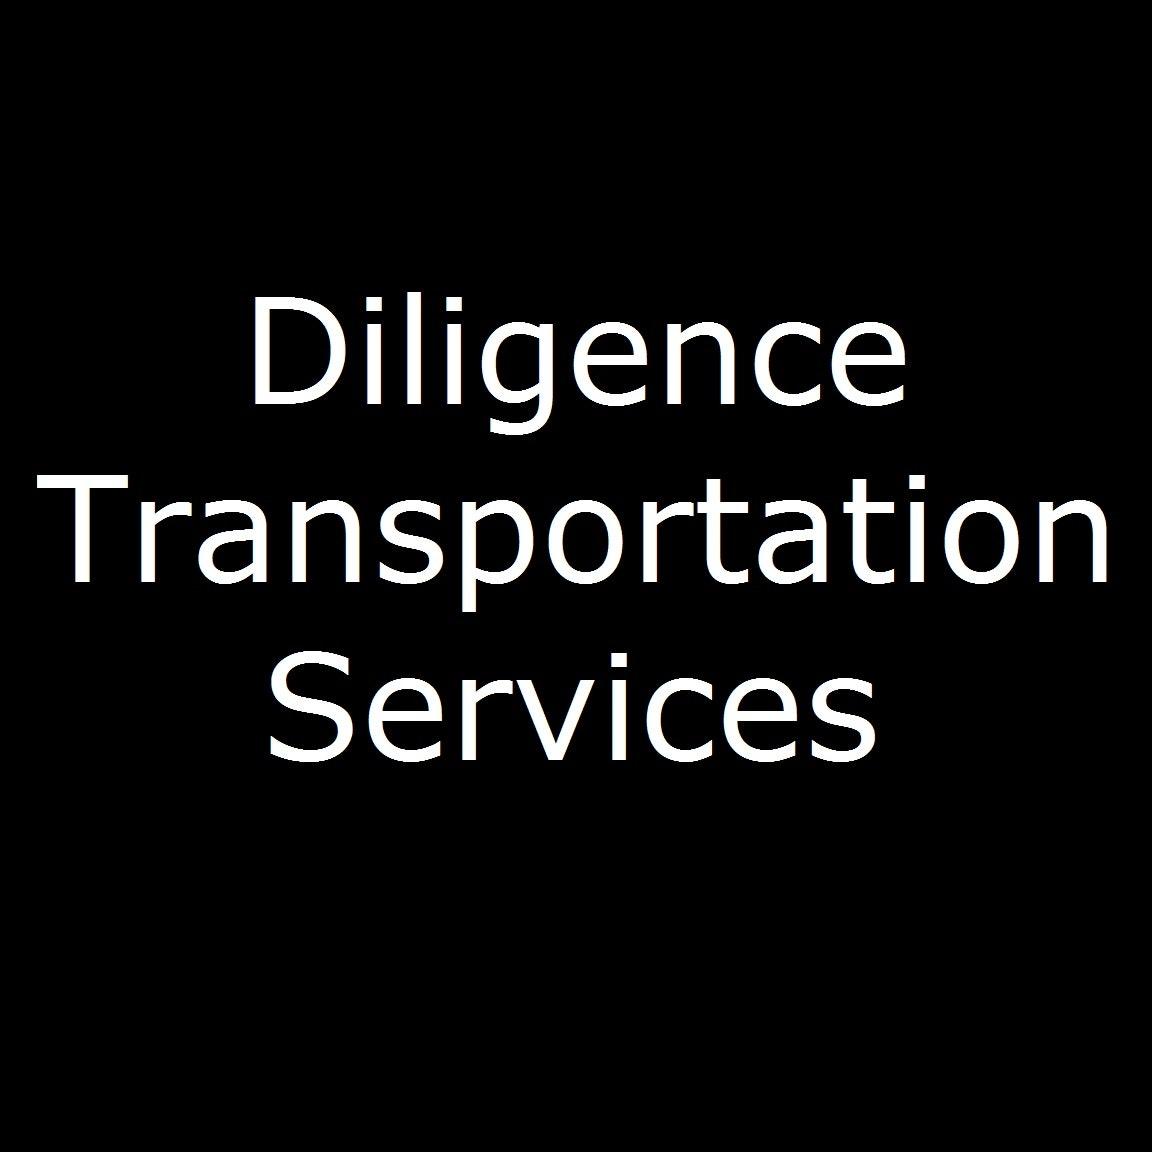 Diligence Transportation Services